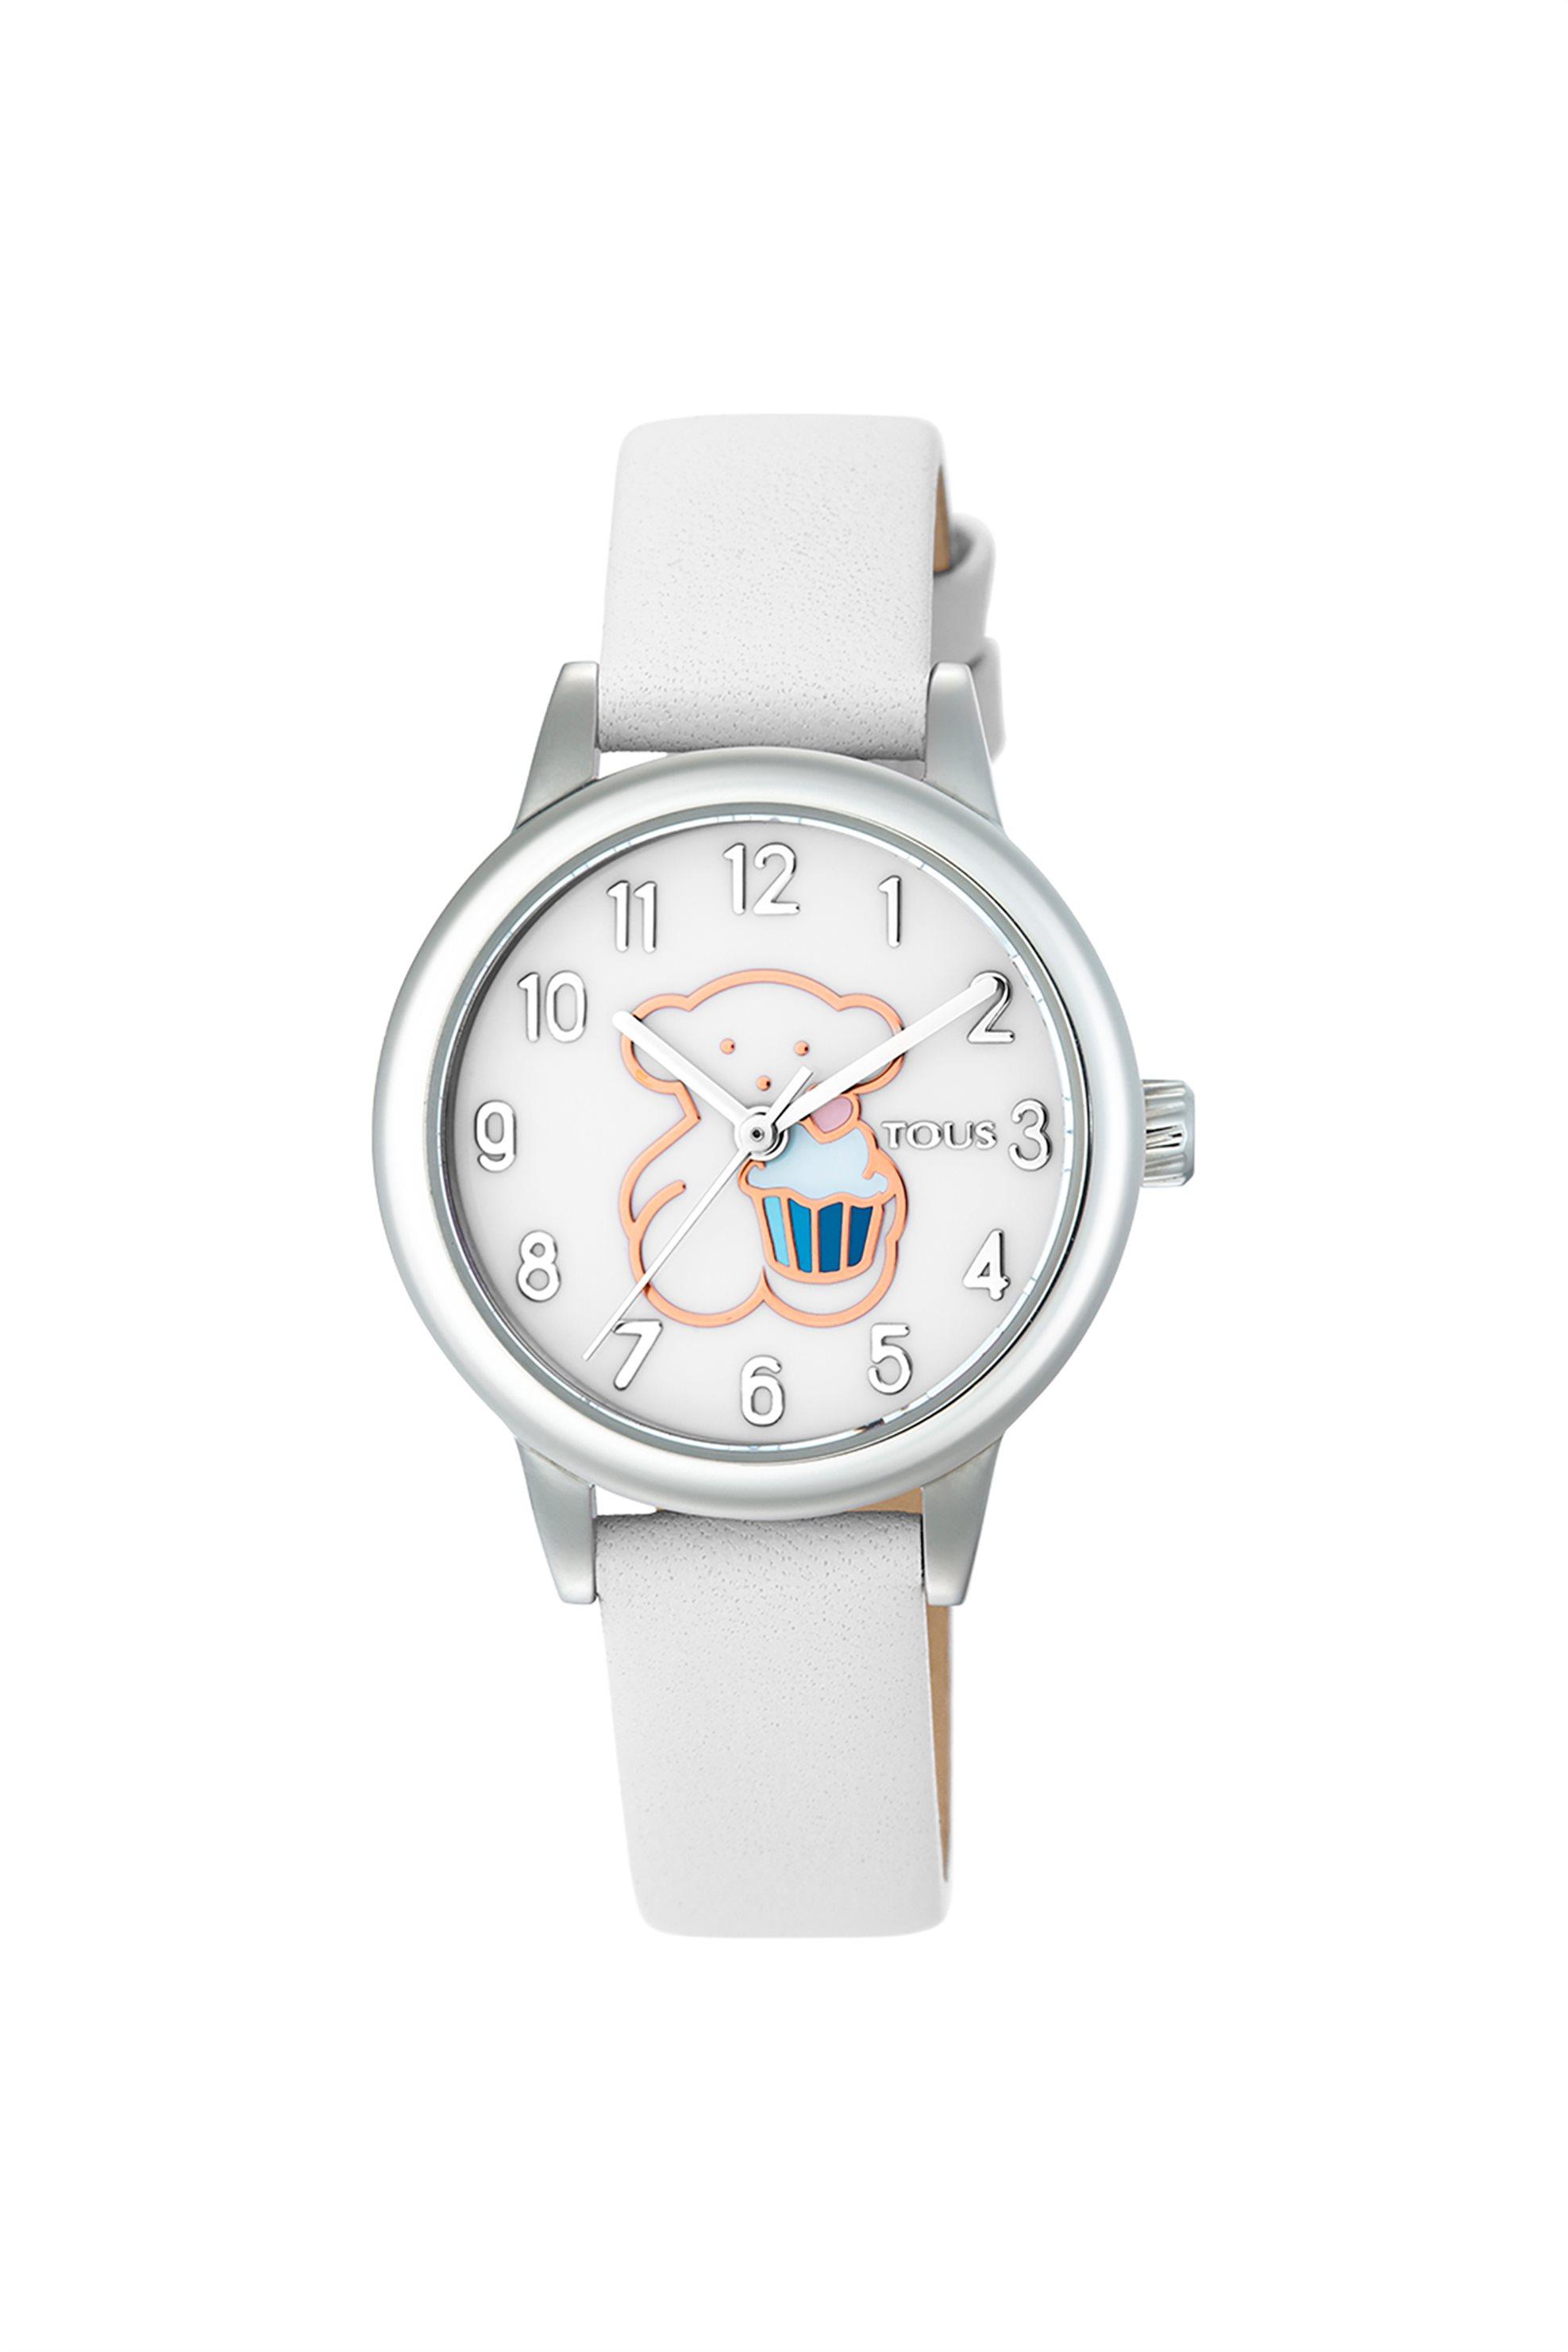 TOUS γυναικείο ρολόι New Muffin από Ατσάλι με λευκό Δερμάτινο λουράκι - 3000086700 - Λευκό